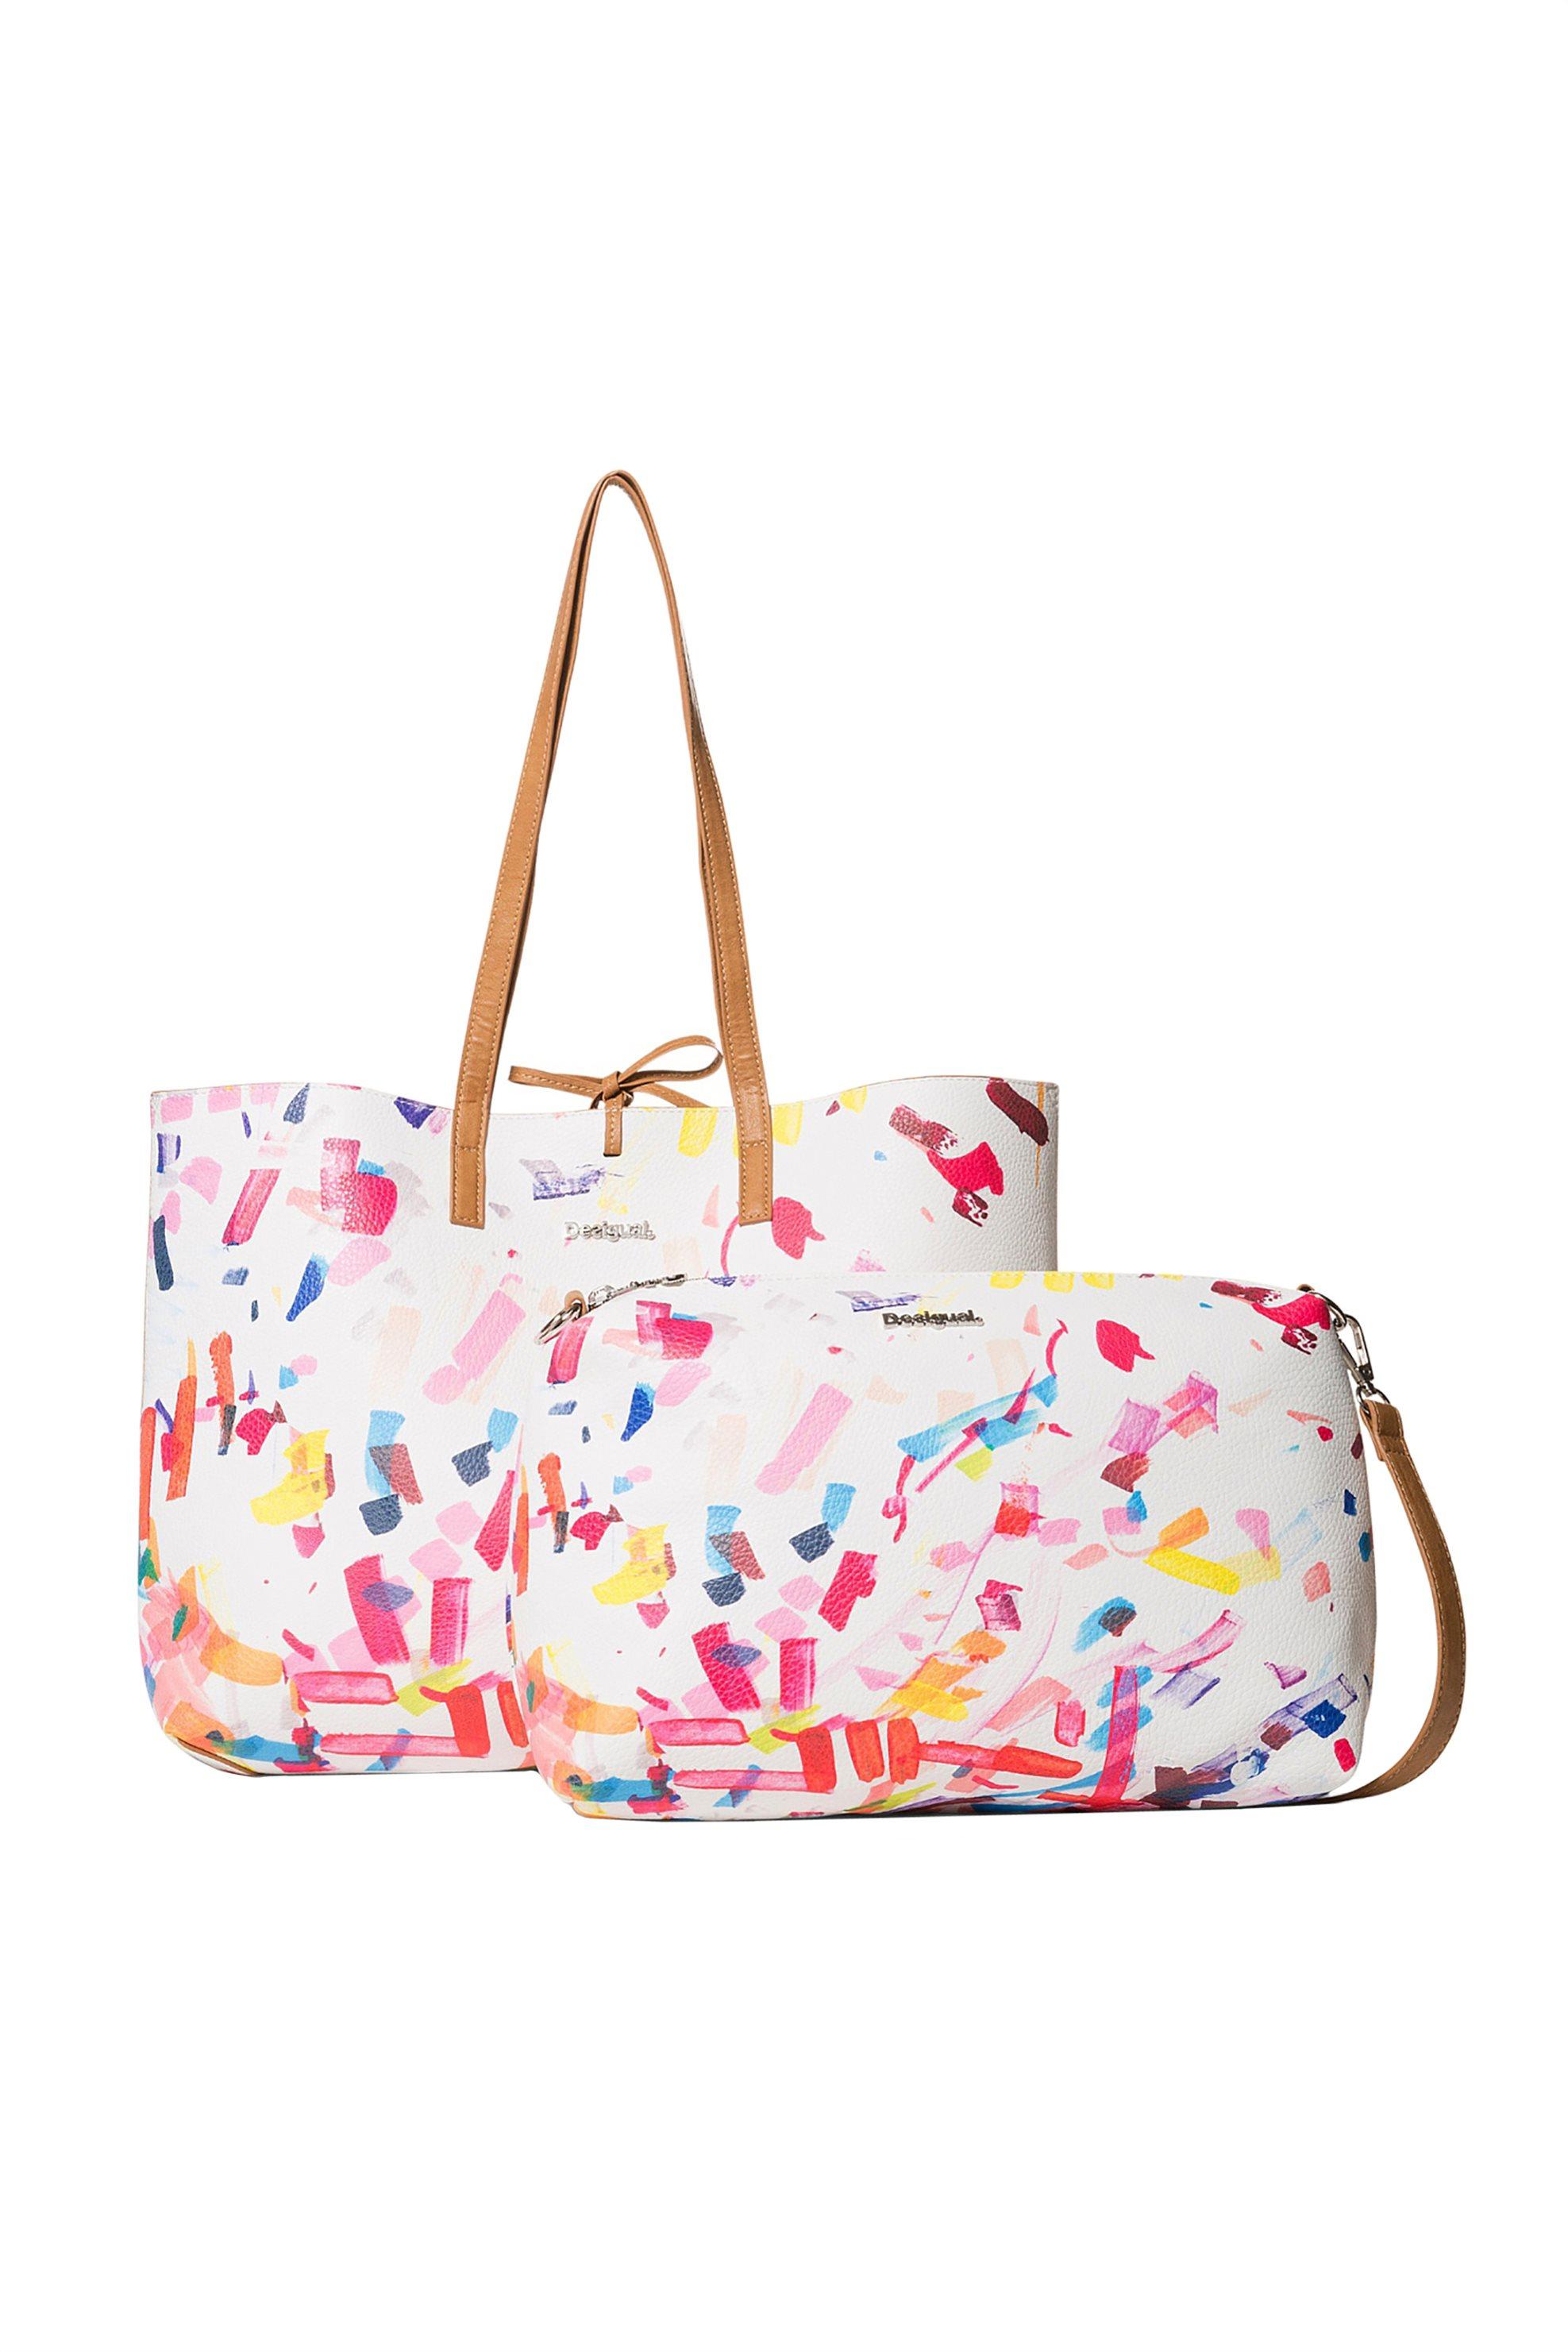 Desigual γυναικεία shopper τσάντα με αφαιρούμενο τσαντάκι - 19SAXP49 - Λευκό γυναικα   τσαντεσ   ώμου   shopper bags